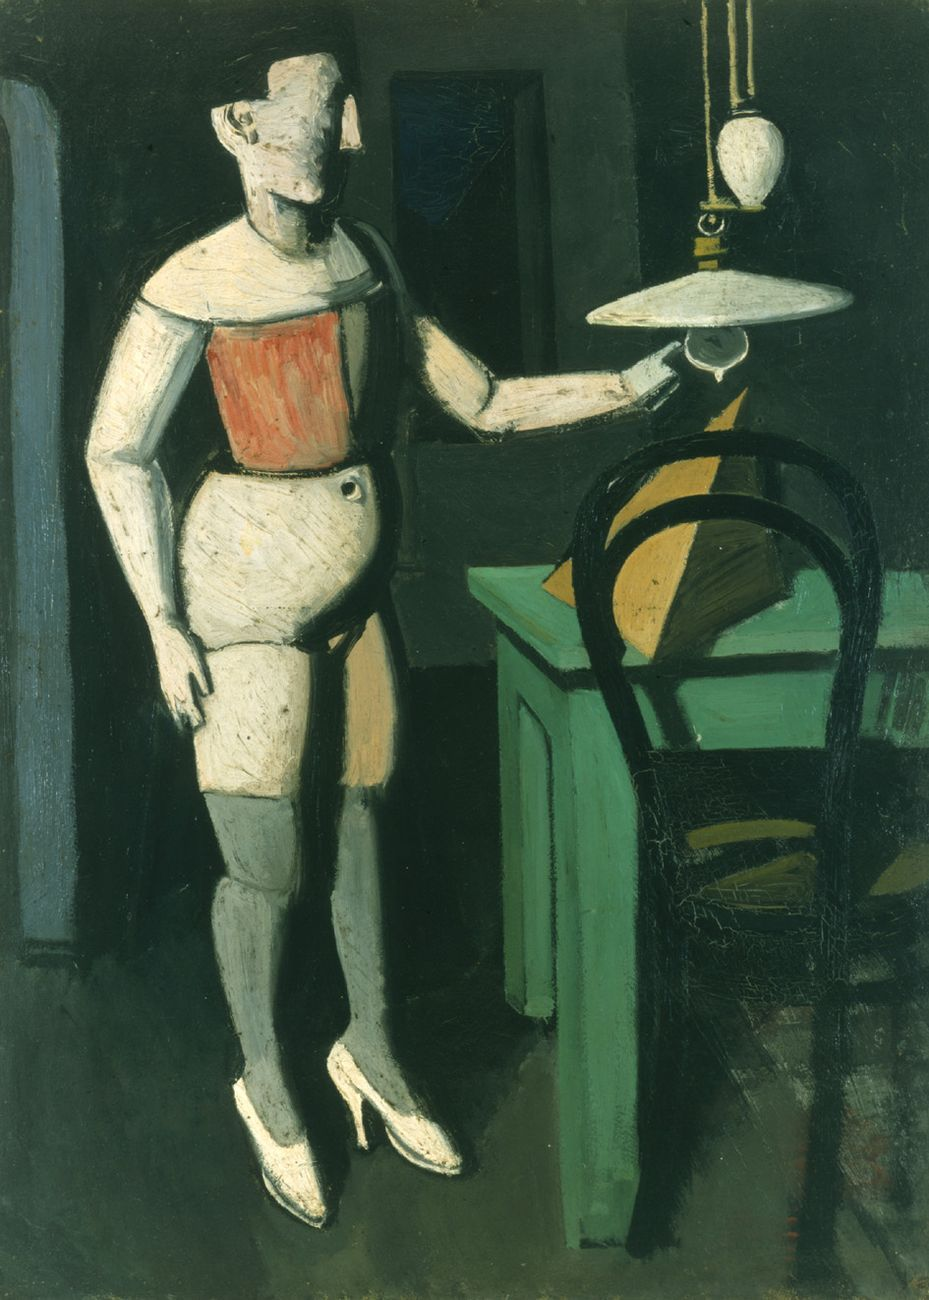 Mario Sironi, La lampada, 1919. Pinacoteca di Brera, Milano